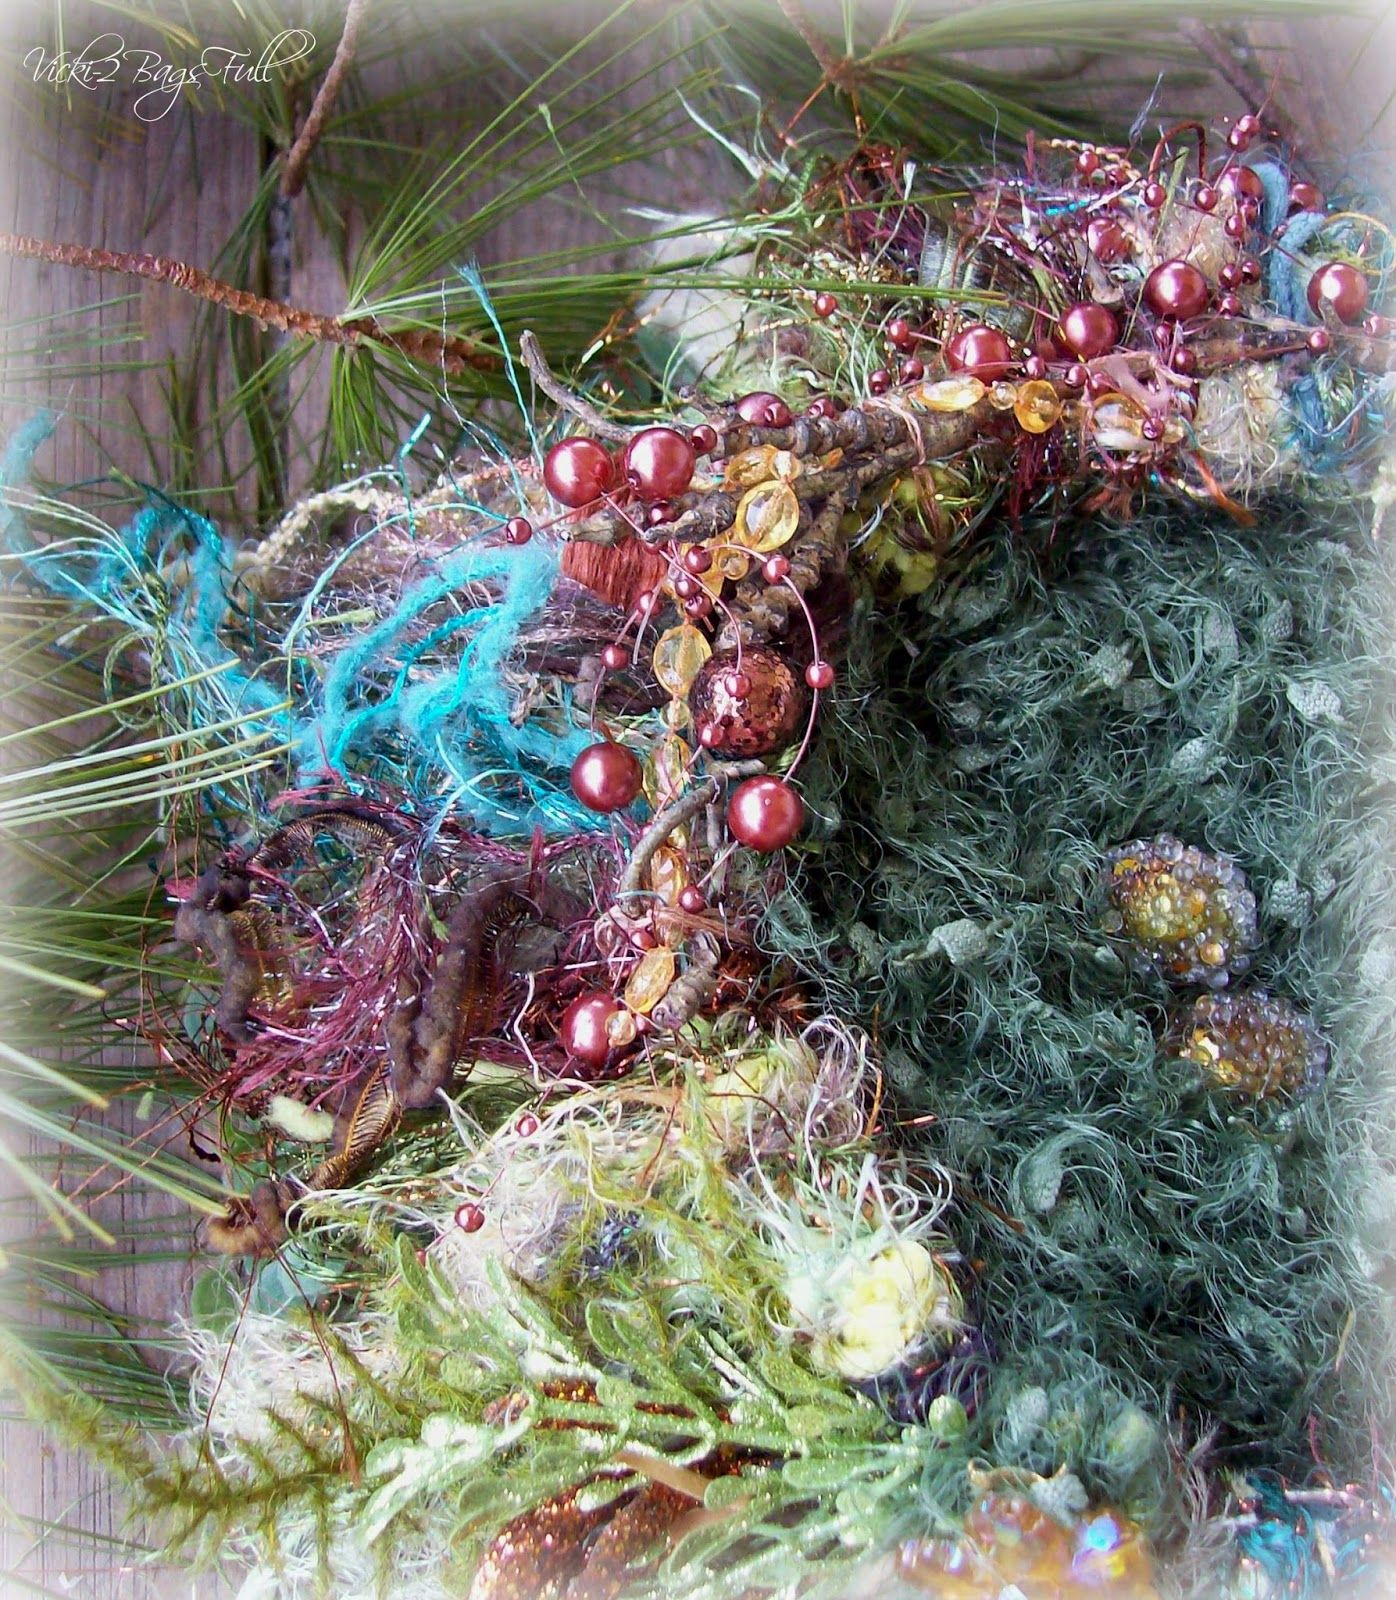 Woodland Bling nest